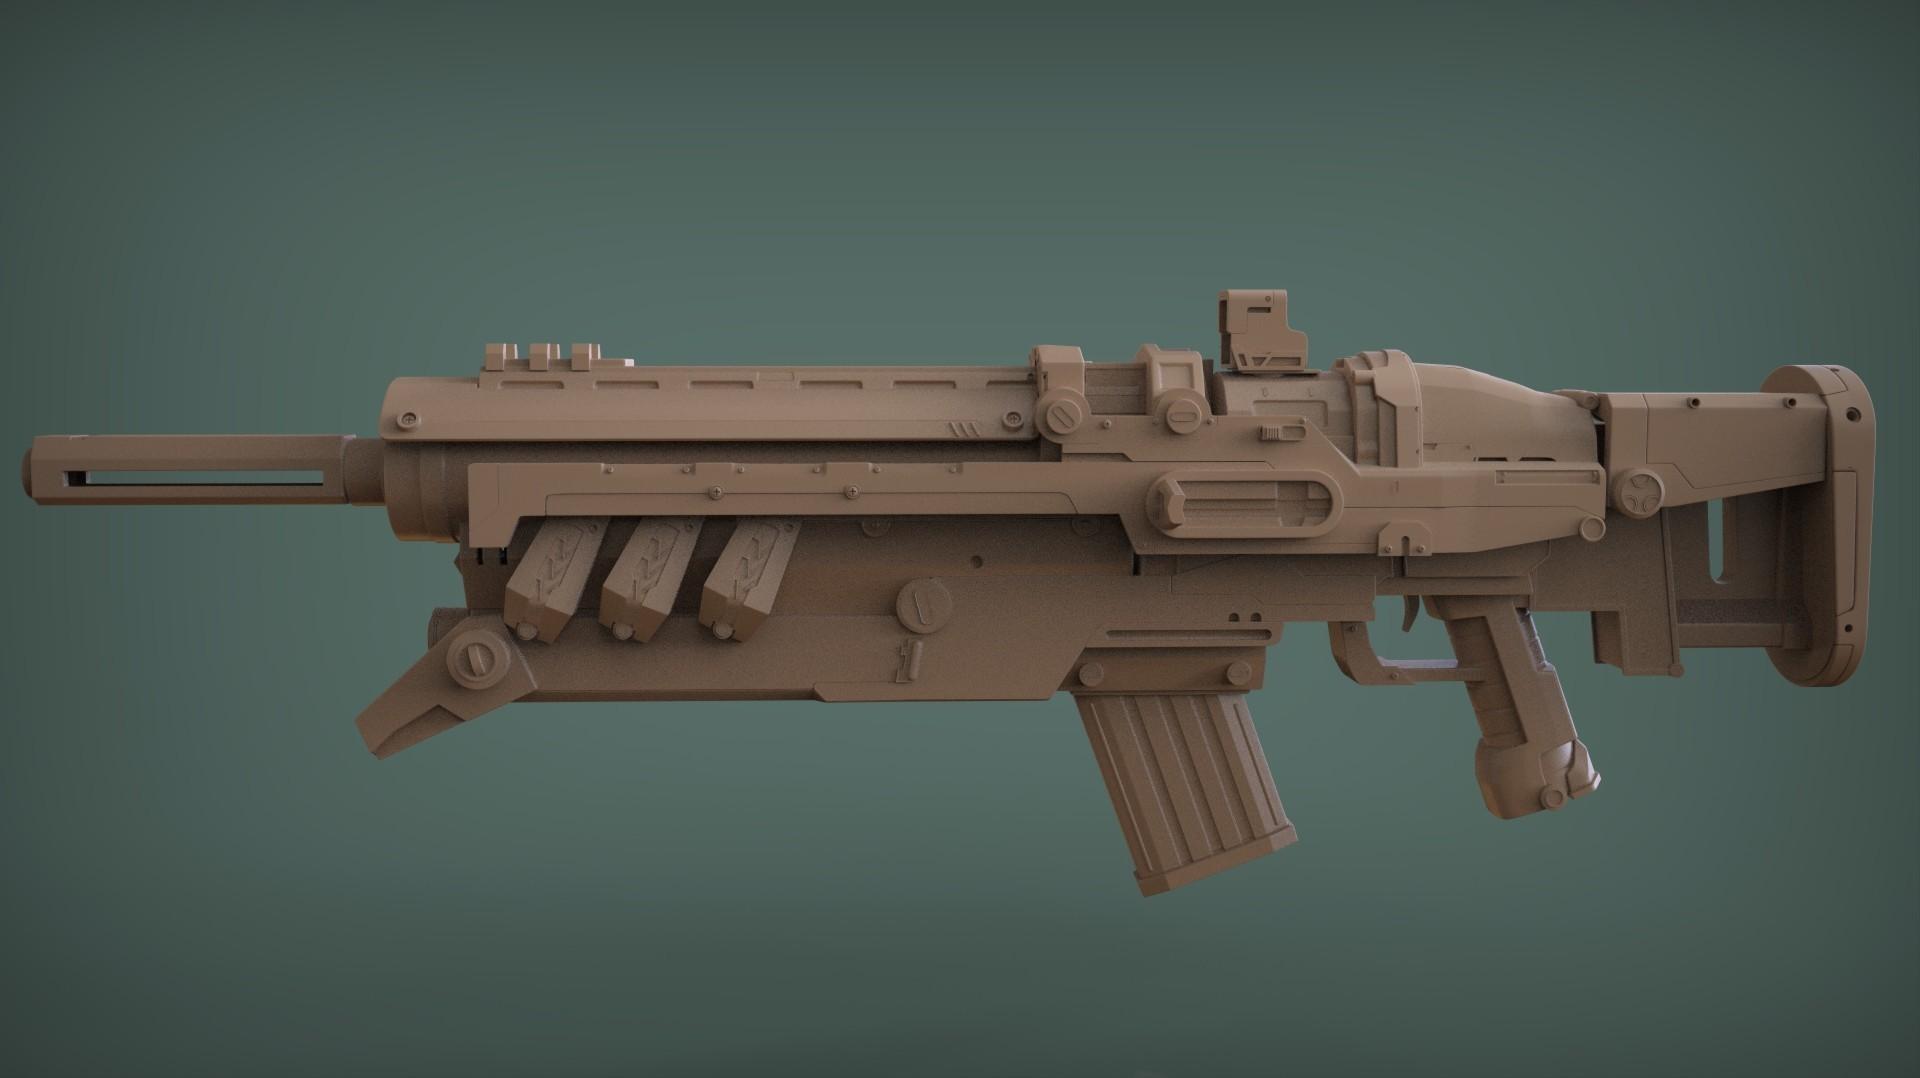 Alexander gonzalez alexander gonzalez gun 001 4